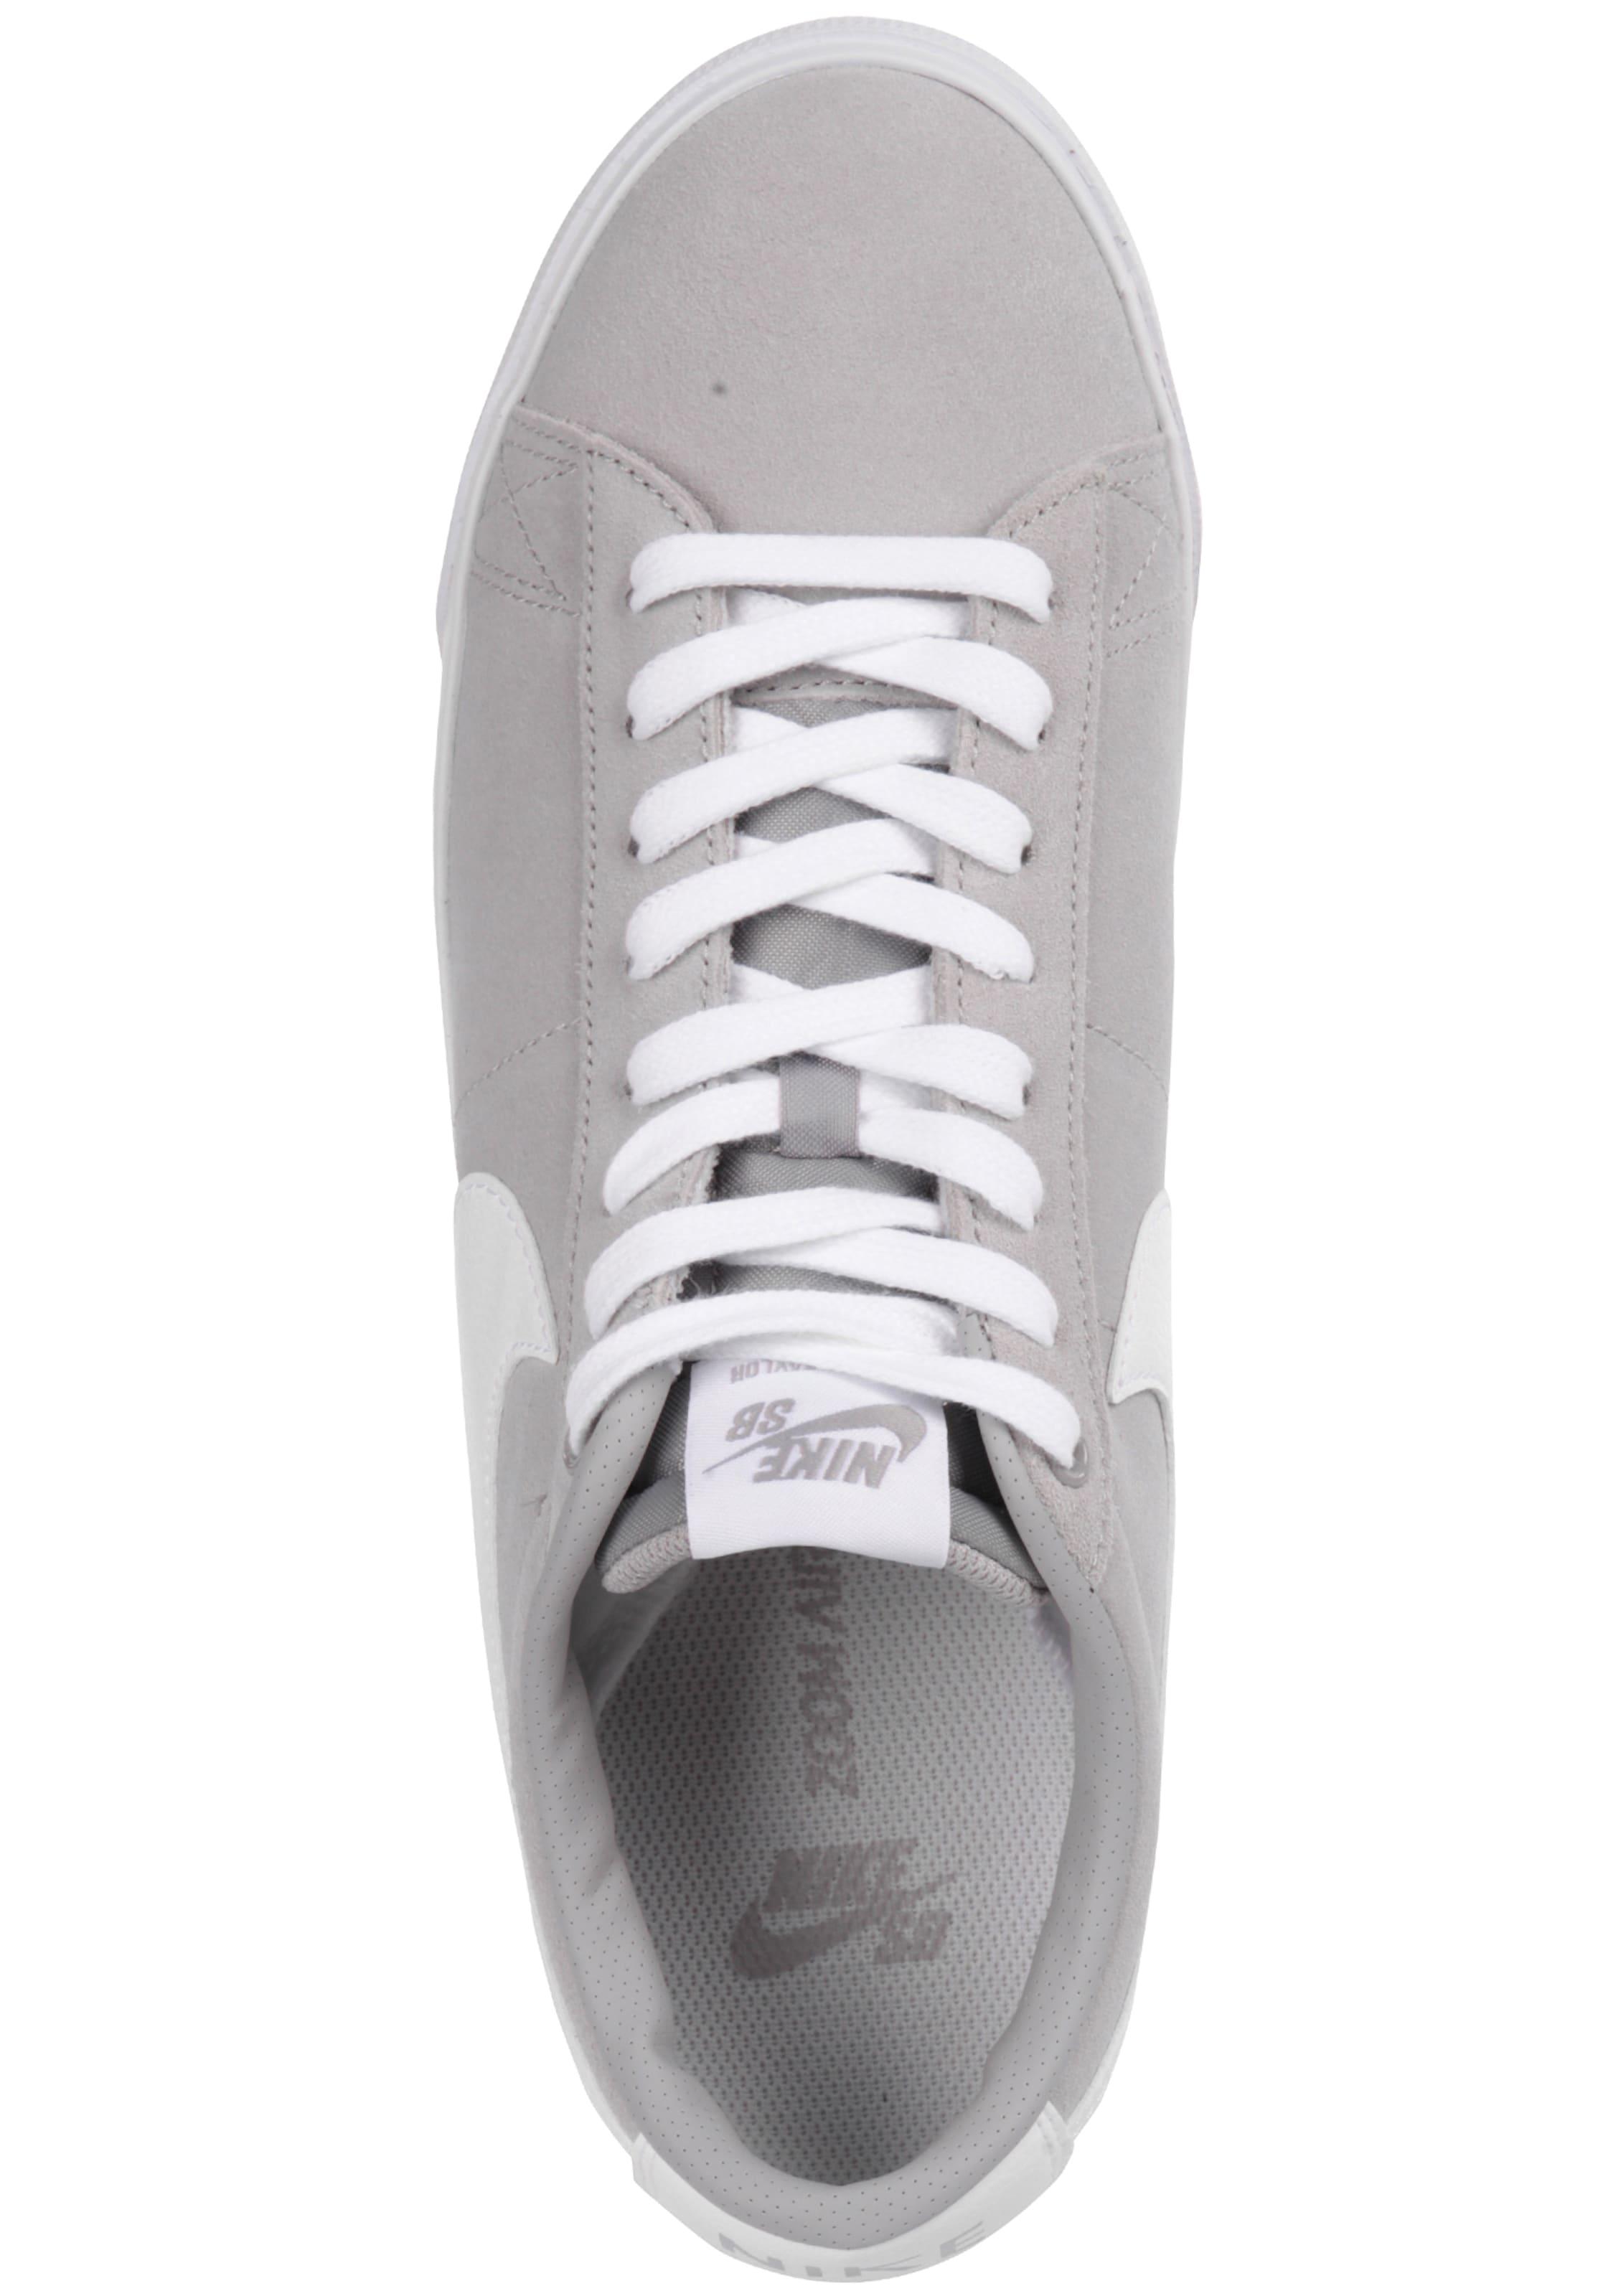 Sneaker In 'zoom Blazer' Sb Nike GrauWeiß f7Ybgv6yIm